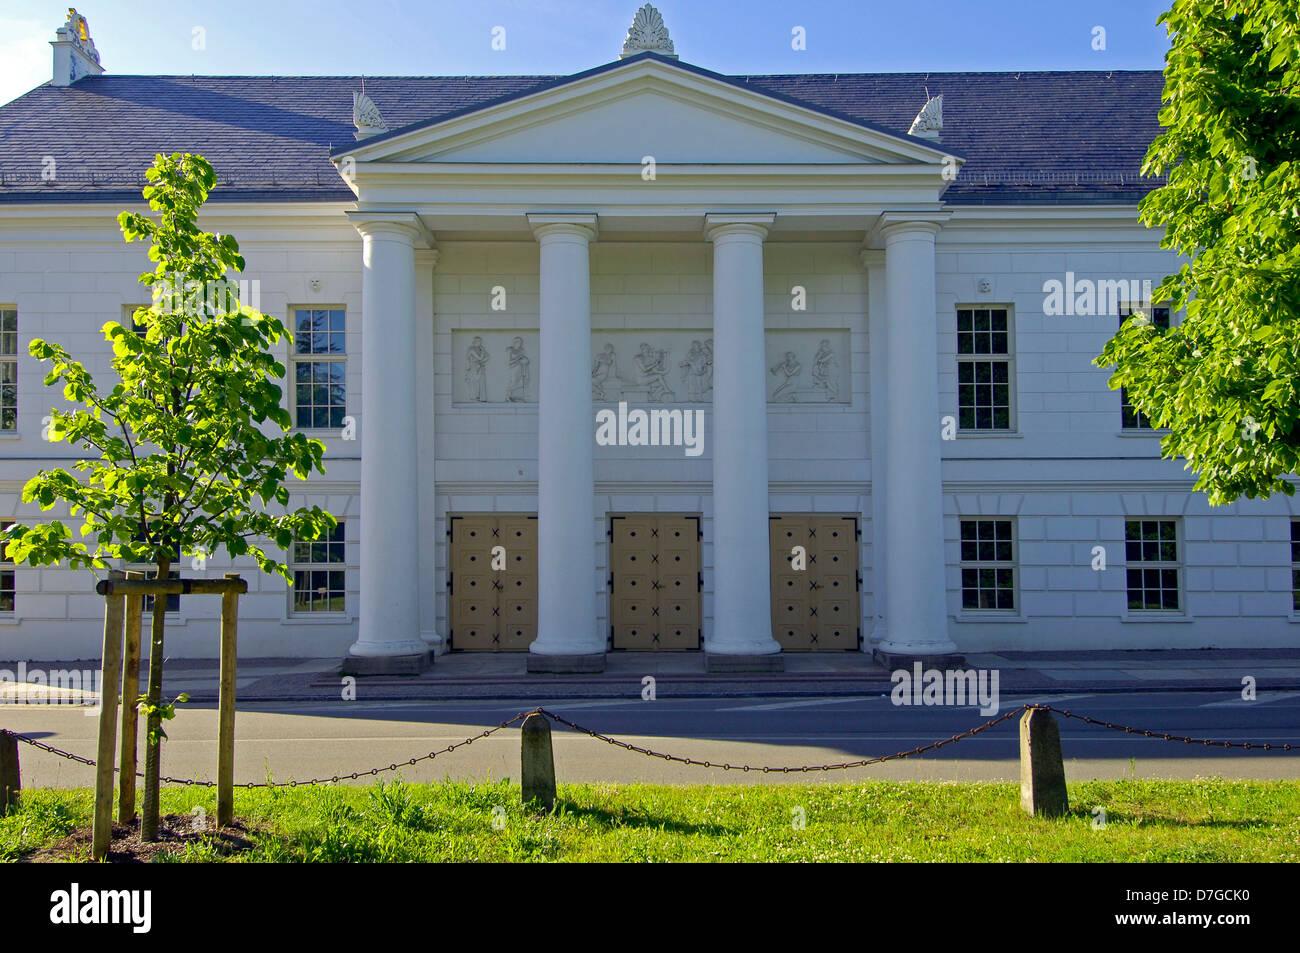 Germany, Mecklenburg-West Pomerania, island Rügen, Putbus, column portico, theatre - Stock Image